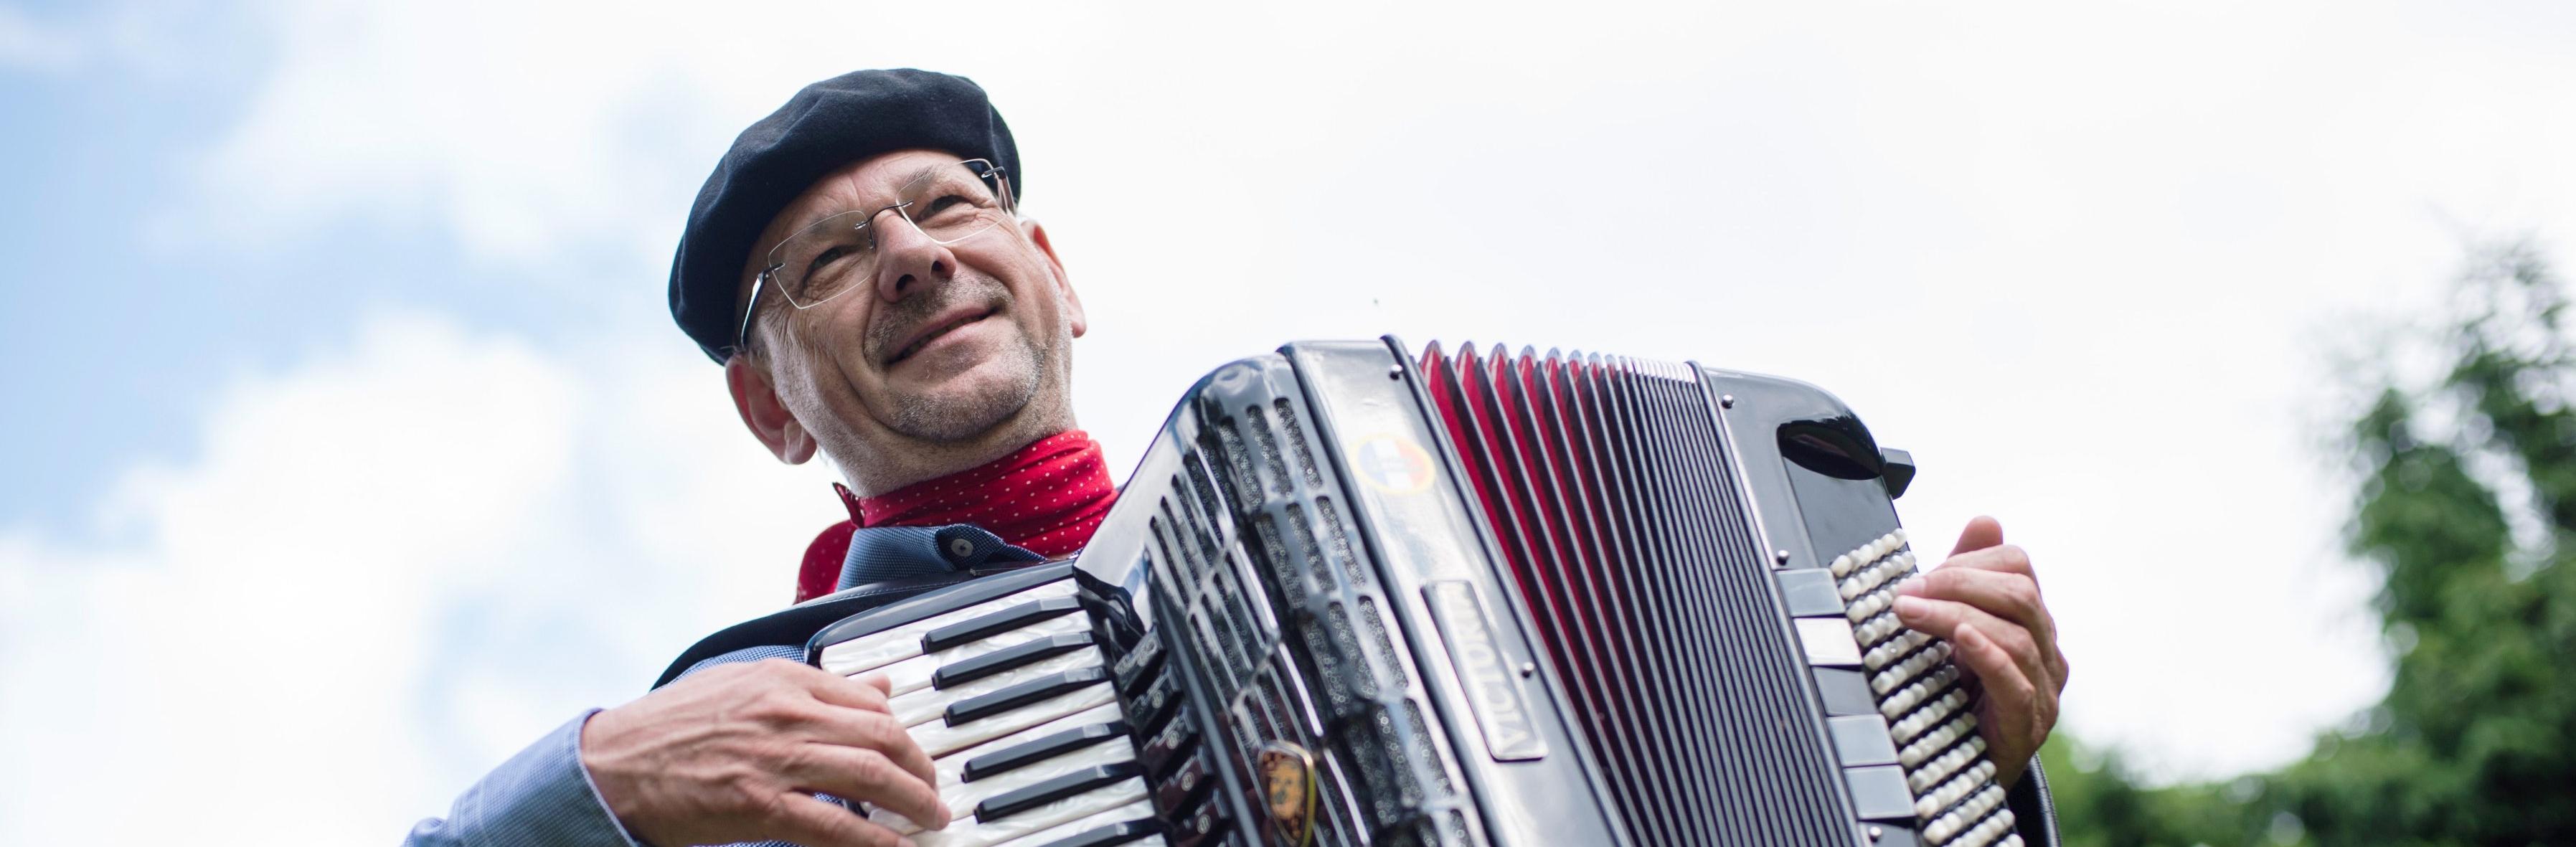 Lothar Meunier